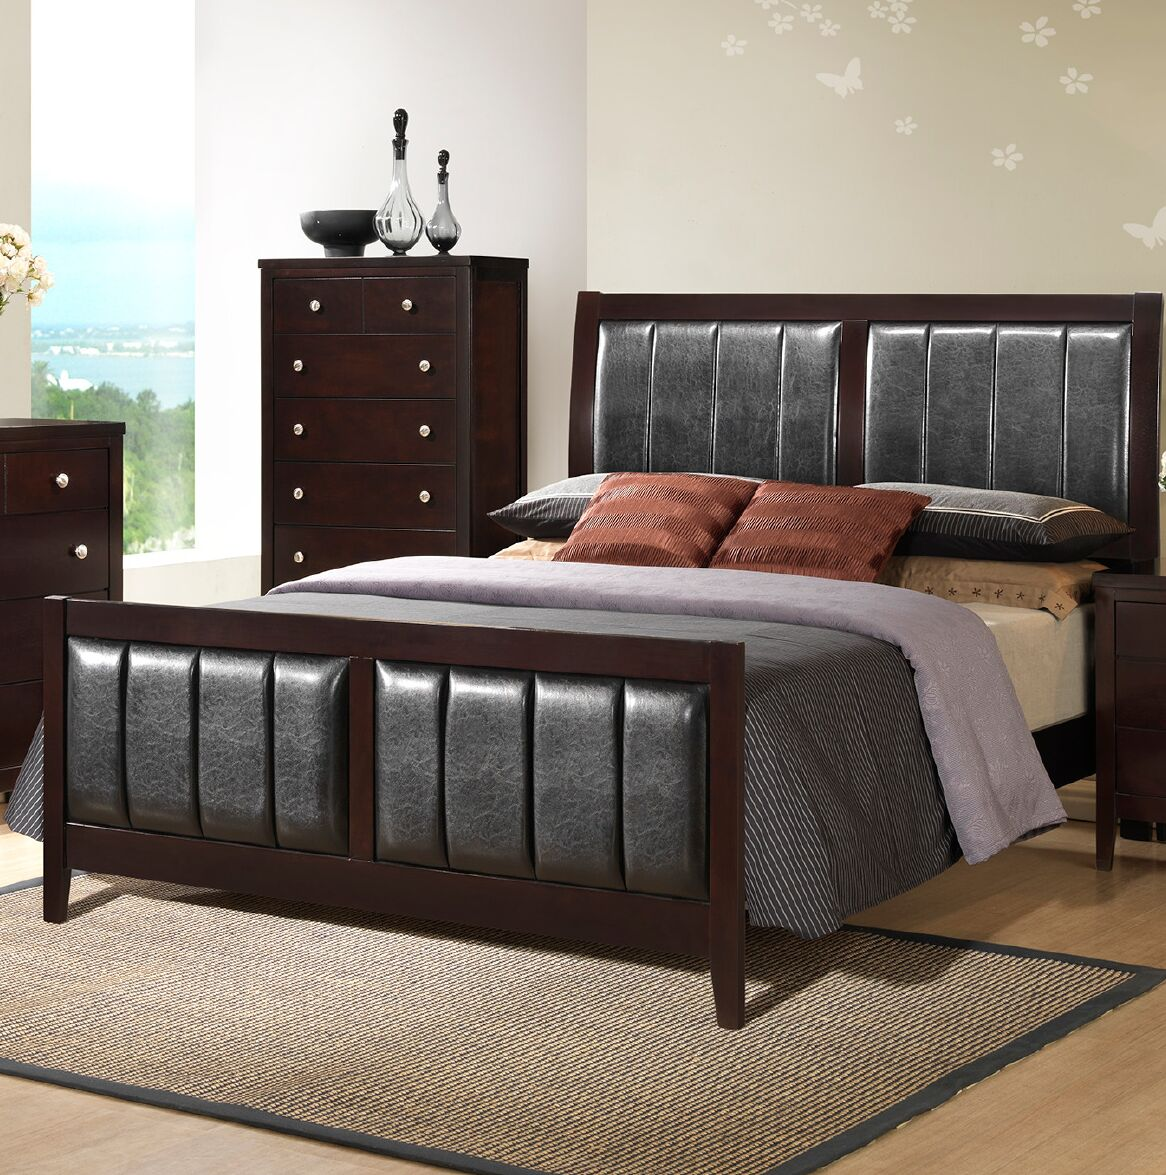 Callicoat Upholstered Panel Bed Size: California King